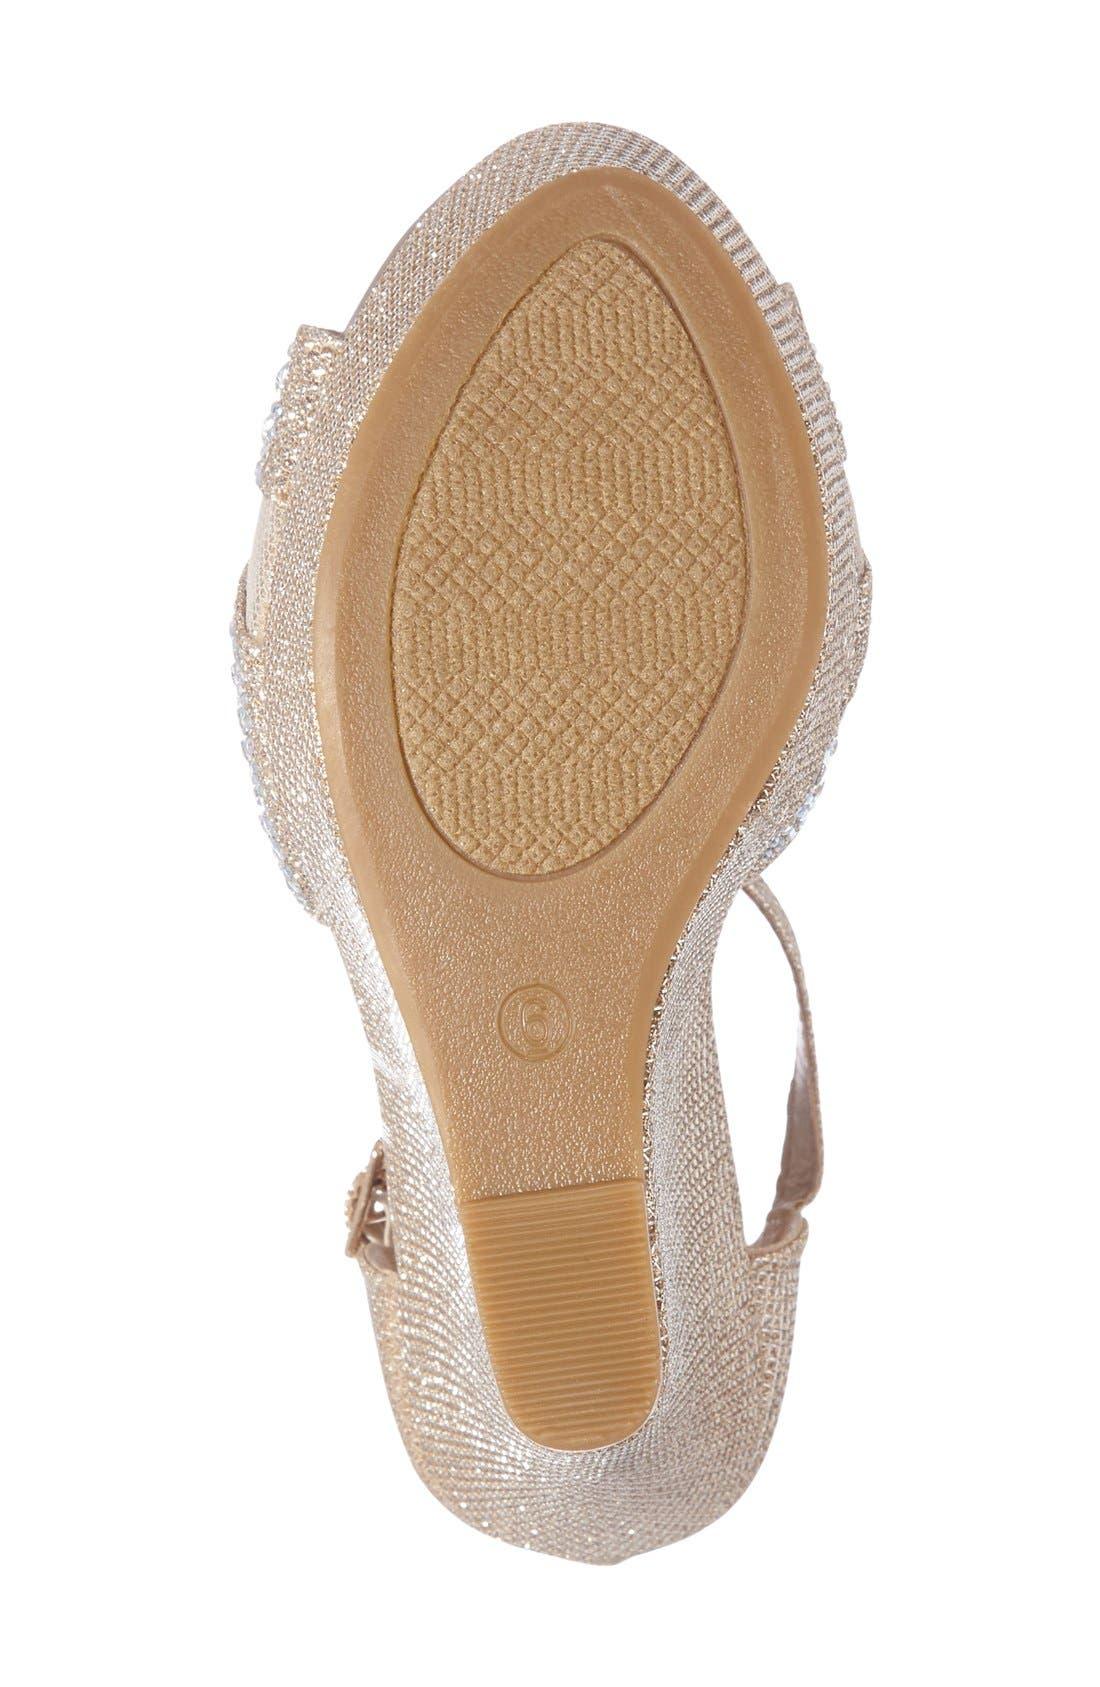 Ness Crystal Embellished Wedge Sandal,                             Alternate thumbnail 12, color,